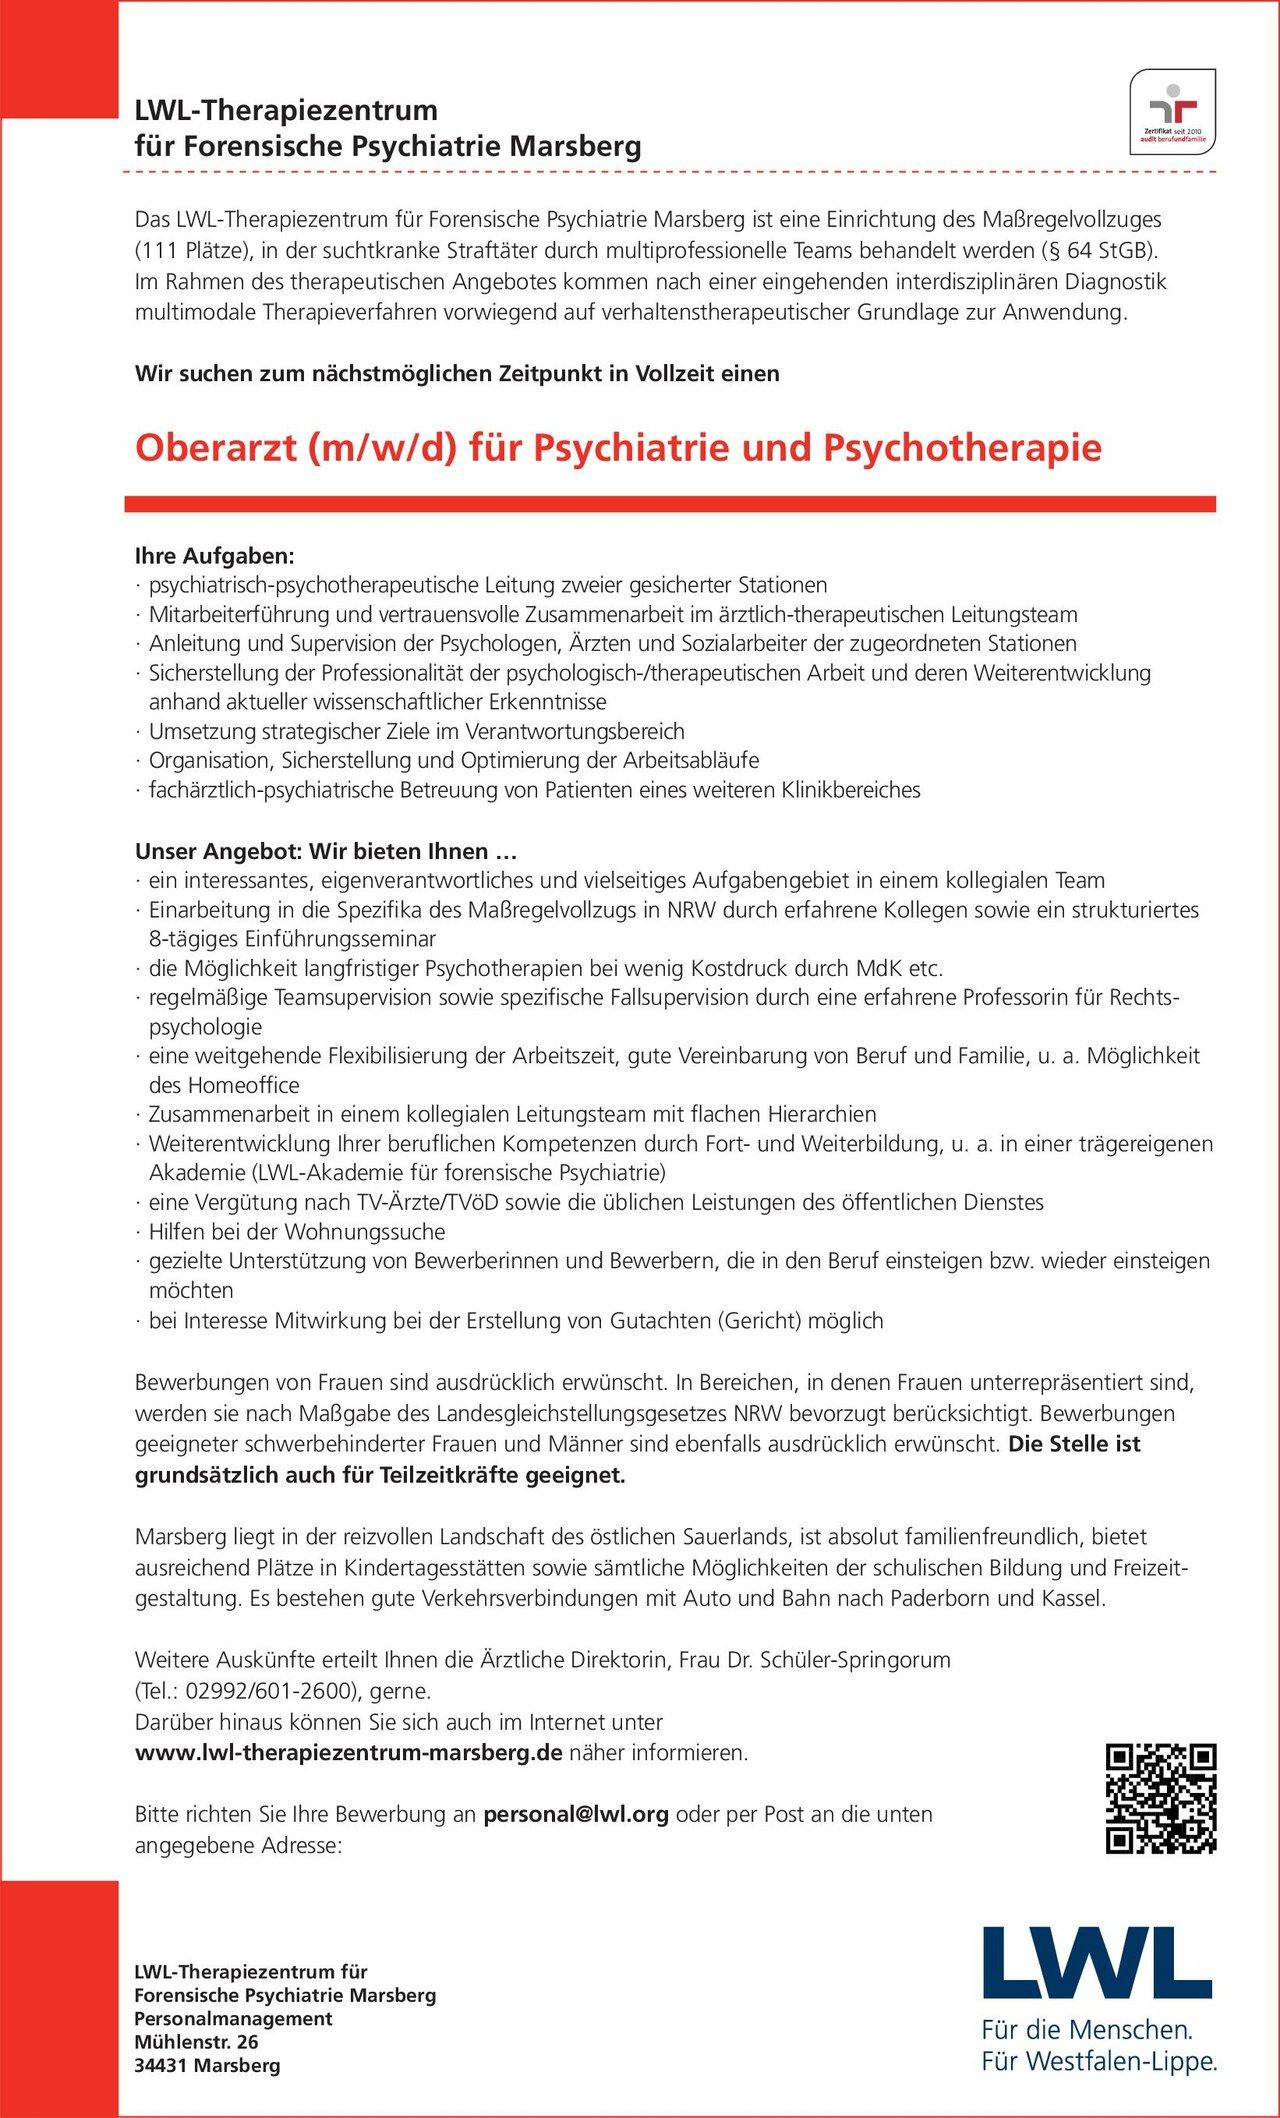 lwl therapiezentrum fr forensische psychiatrie marsberg oberarzt mwd fr - Bewerbung Als Sozialarbeiter